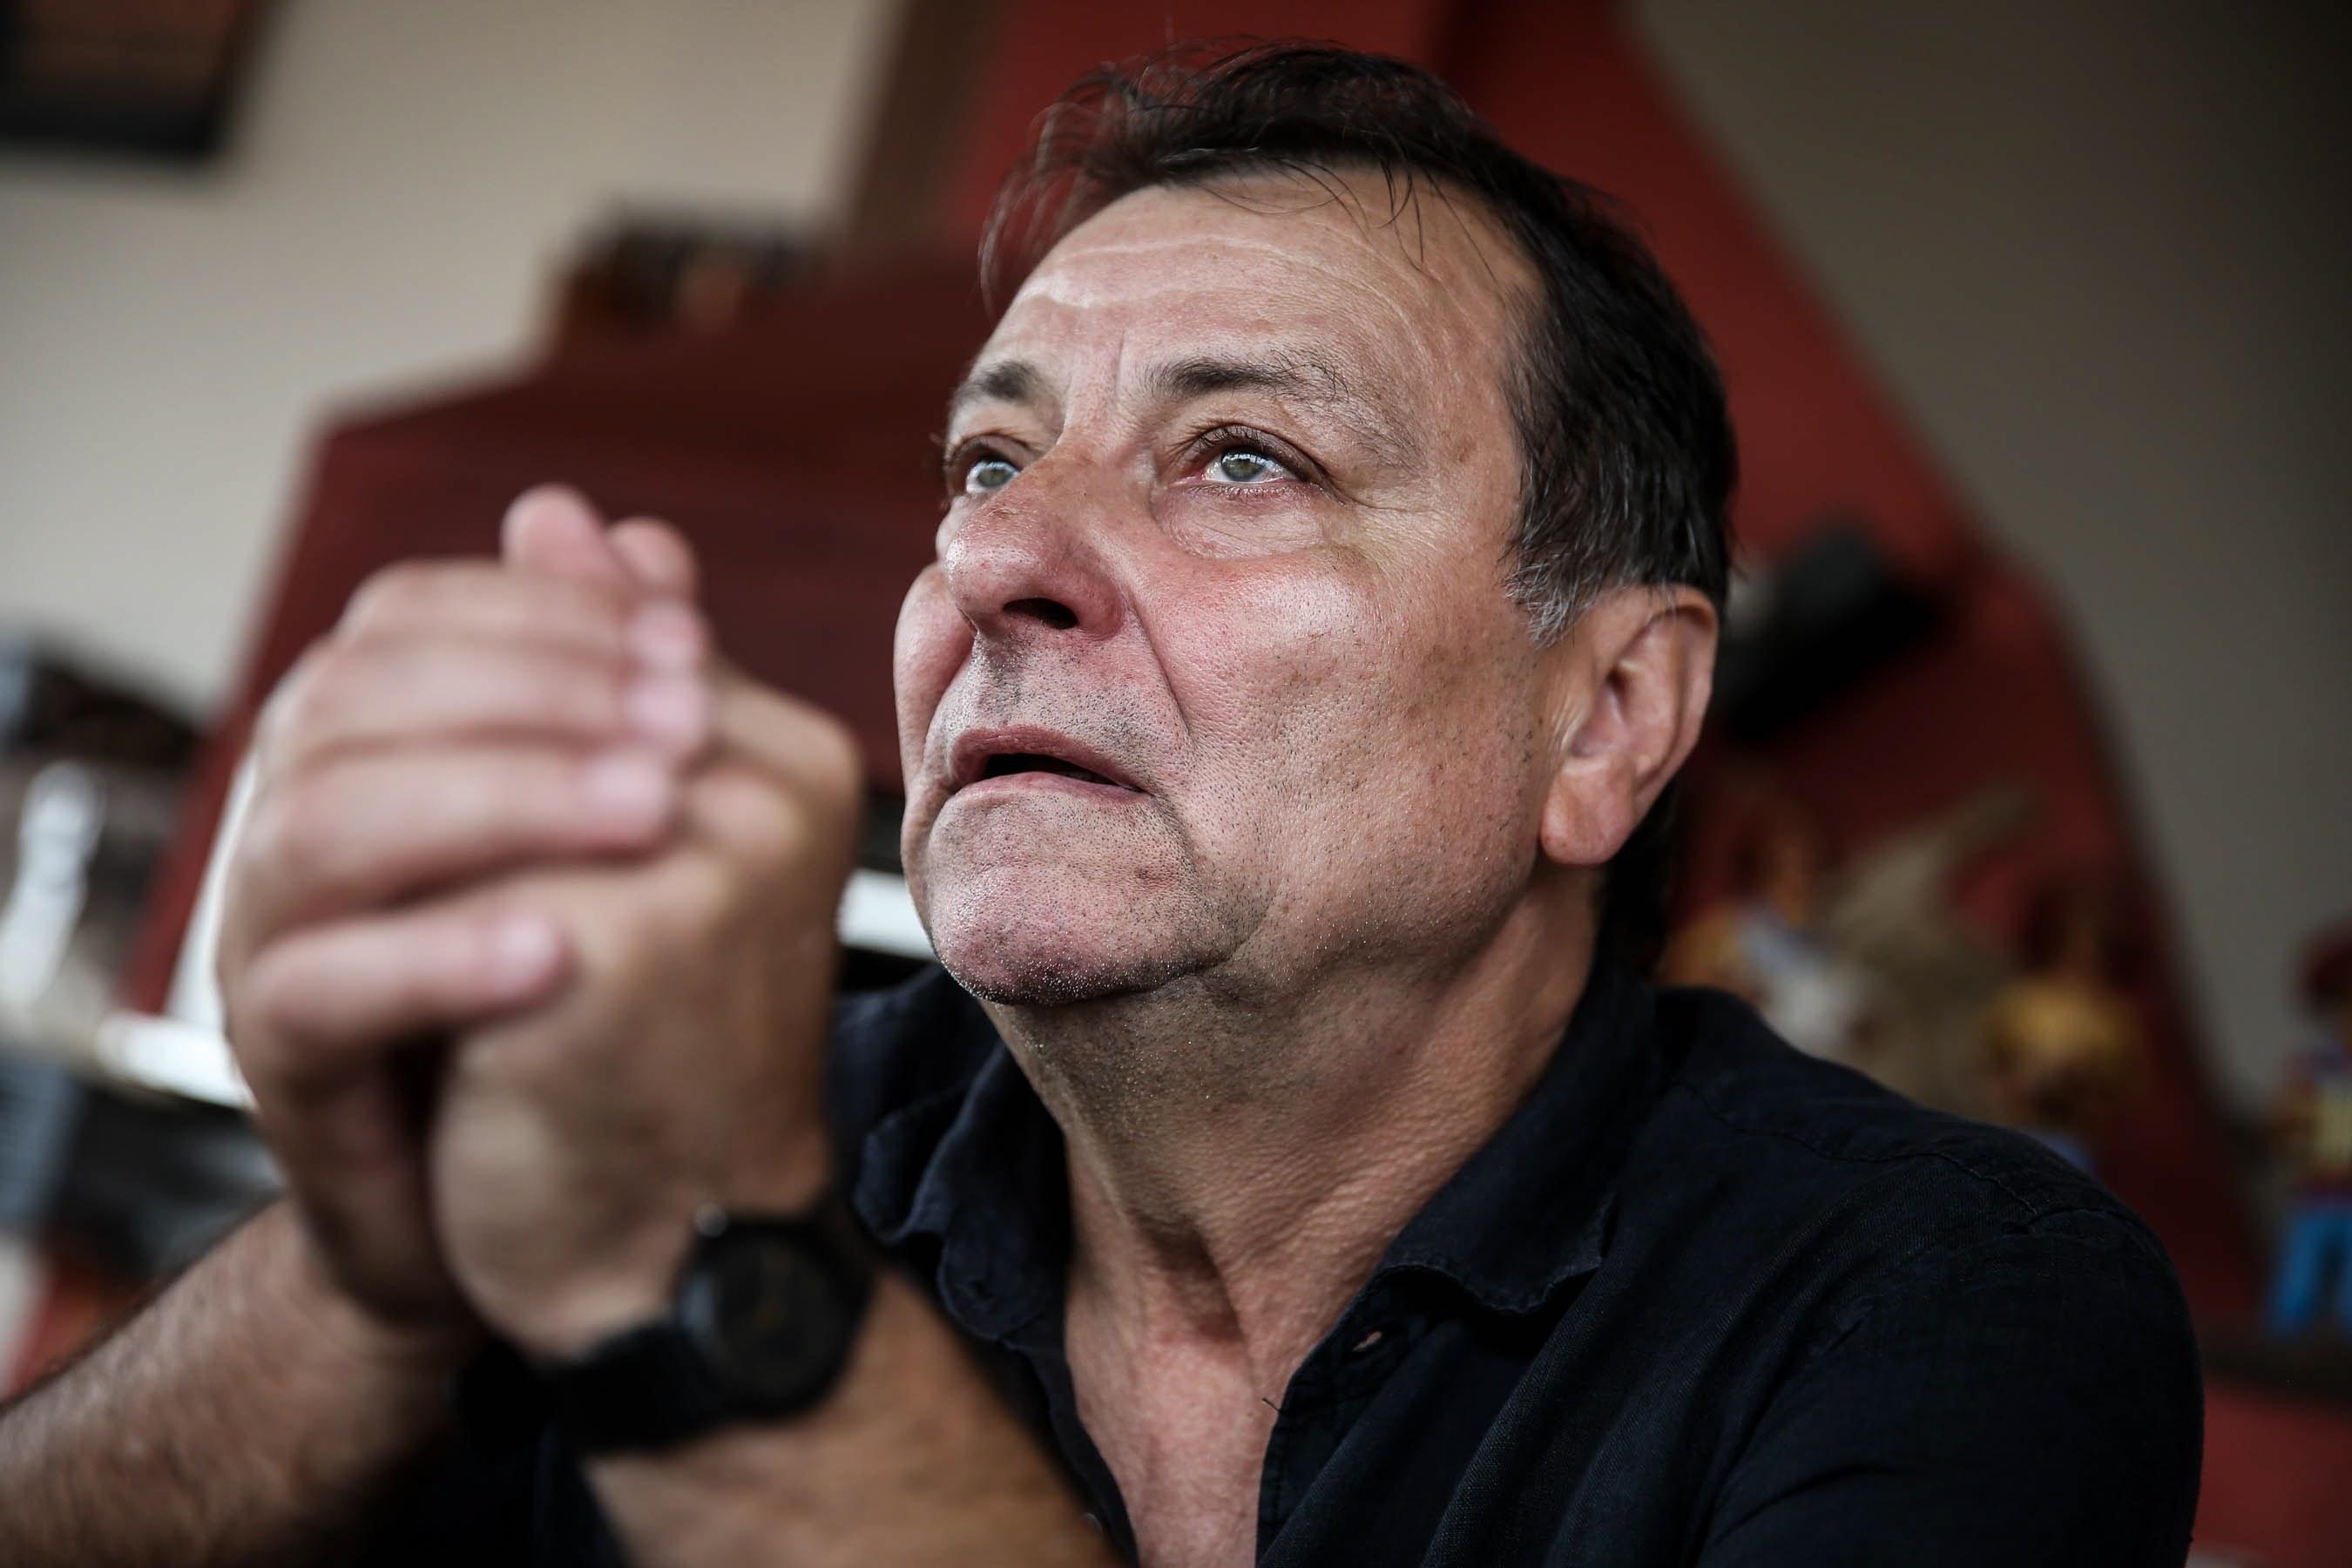 Brasil: Supremo Tribunal levanta medidas de vigilância de ex-ativista Cesare Battisti